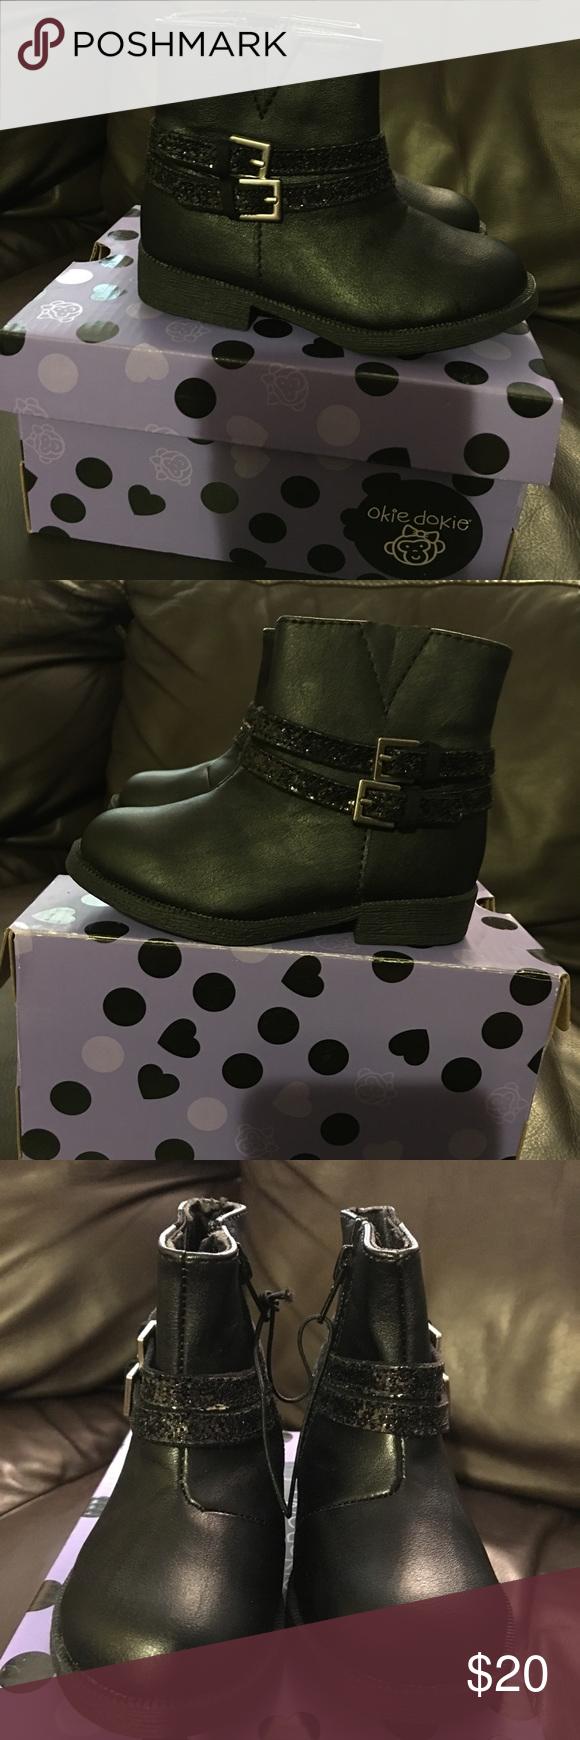 Brand new boots okie dokie Brand new boots okie dokie 7 medium black okie dokie Shoes Boots